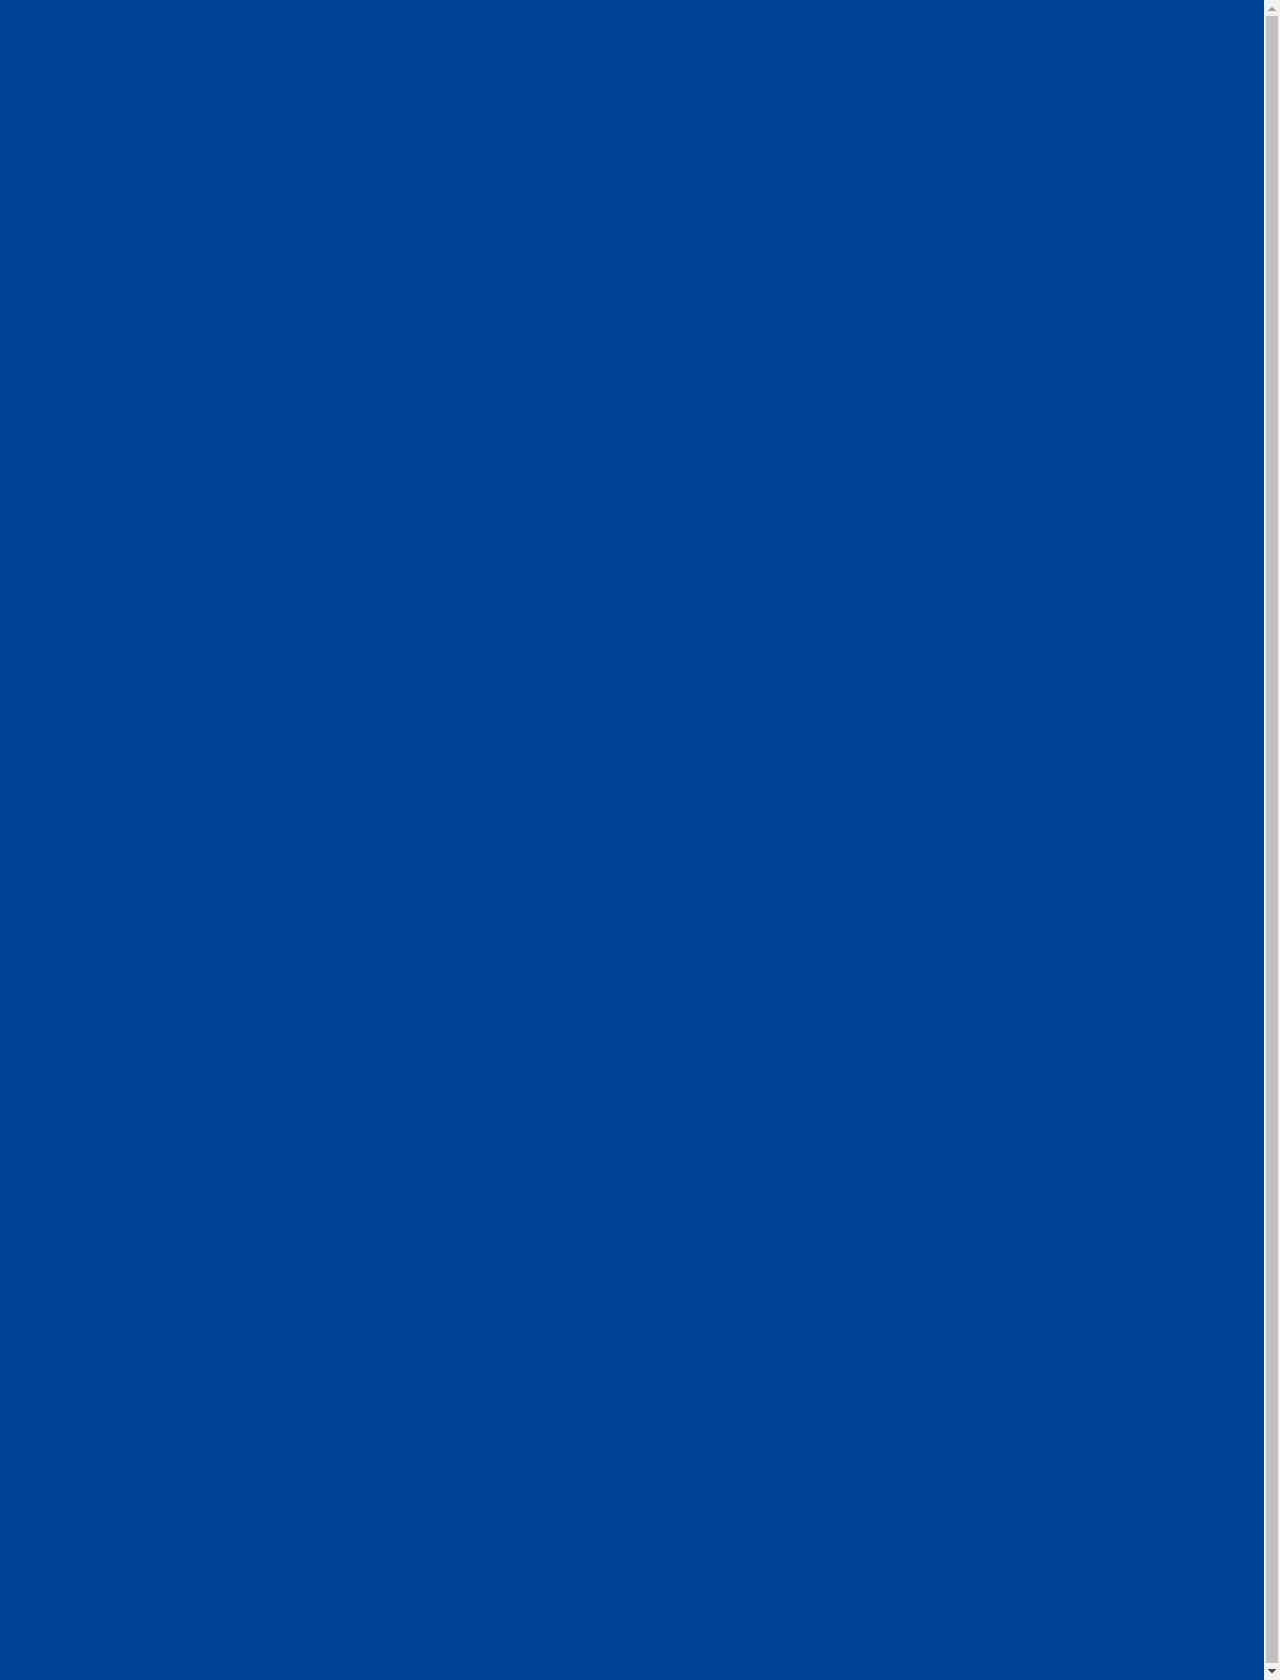 Screenshot Desktop - https://login.microsoftonline.com/94c3e67c-9e2d-4800-a6b7-635d97882165/oauth2/authorize?client_id=efadf452-c497-431f-af59-957a17741cc9&redirect_uri=https%3A%2F%2Fmaxwell.bd.com%2F&response_type=code%20id_token&scope=openid%20profile%20email&state=OpenIdConnect.AuthenticationProperties%3DLZZxRmGesDRDupiZYi1M9dU5wh92WGz4sH8ULMTELuGMPmH5PX2YI7CJh62Fr9F0pFIQxZuv96pZCyU9KT4HDTBW4R3jyMaZm-taugE0zurcm4x3qz3XhD3-4R_z5YvLDHHEoQe_-CIx5aAqgRvC2iL_5C55TPIE9JWaKzRtizWh8SfAgsKcV3-Z3WQbG3SCRsT7aMbbXQgGAQwrifBmuPEWengqi-l81hSLb2OwxvJfQvRIkfOj0gp-3kjD8SB1&response_mode=form_post&nonce=637588921307169443.MzY4OTRlMTQtNzU3ZS00Y2U3LWEzYTMtNzFjZDI2ZmRhNzNhMzZiYWM3NDEtODMyOC00NmJhLWE5ZDItMWU1MTdjYjY0NDgz&domain_hint=bd.com&x-client-SKU=ID_NET461&x-client-ver=5.6.0.0